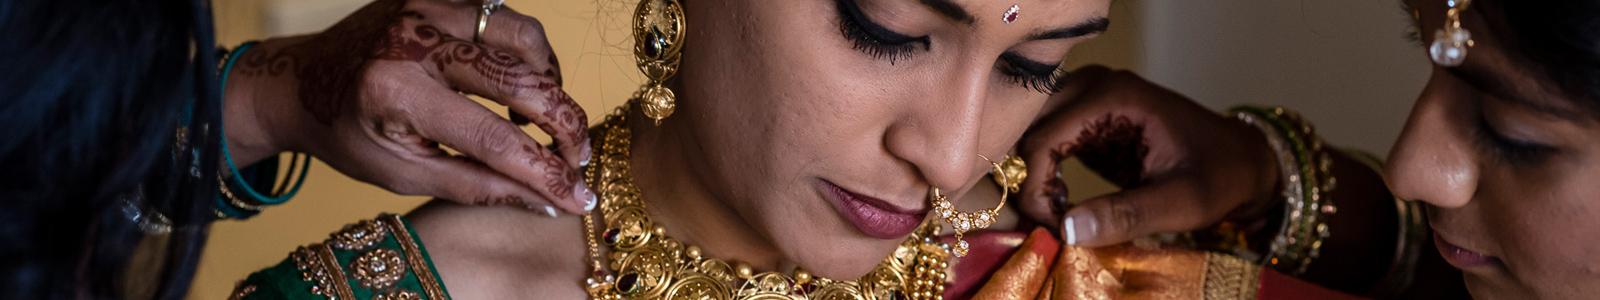 Foto de boda hindú by Mariano Leiva Fotógrafo